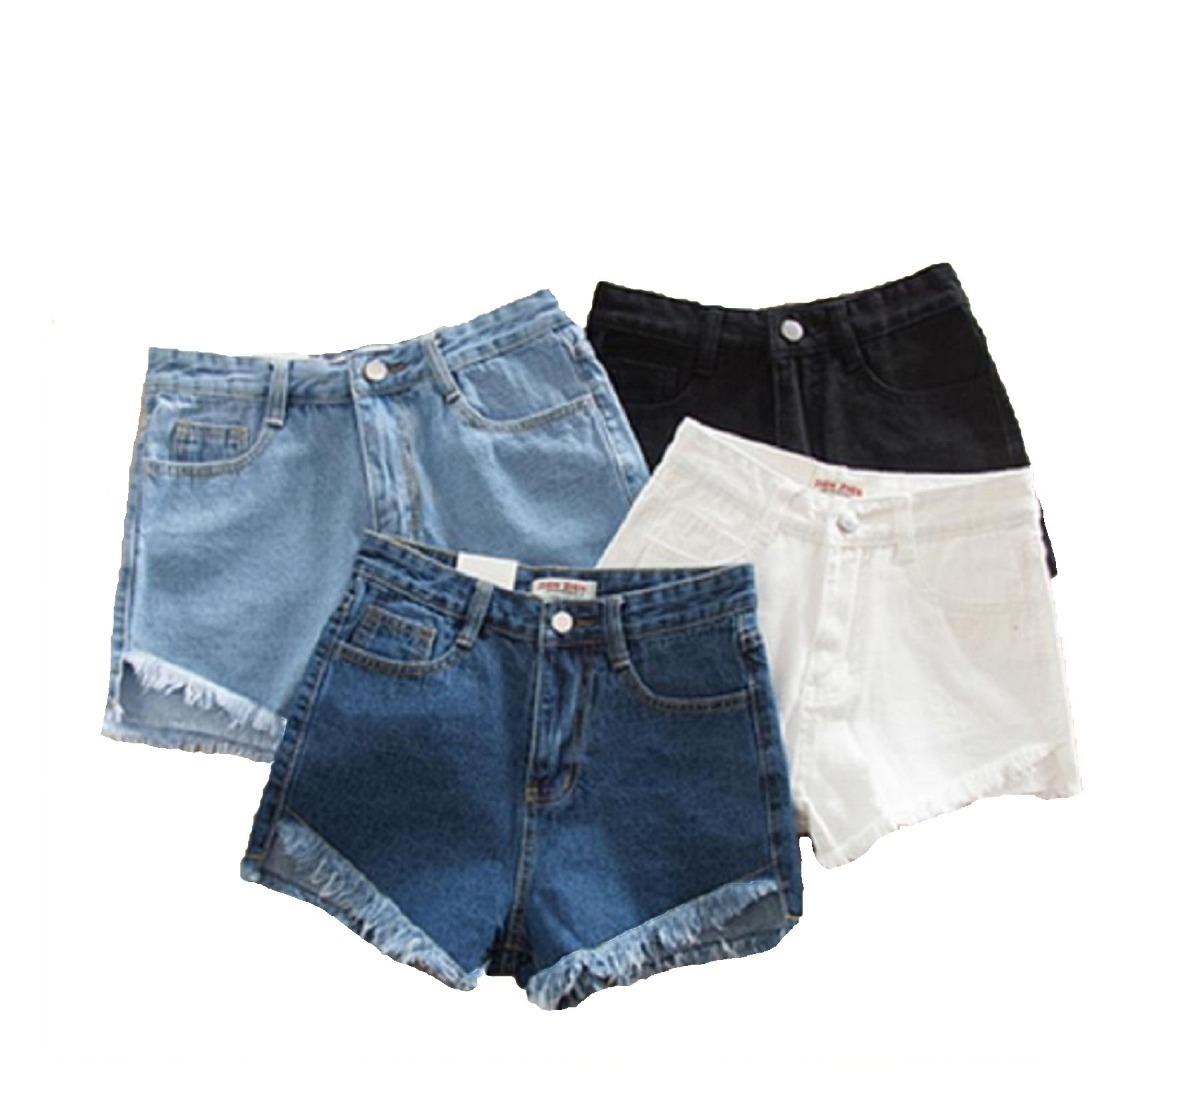 28302053c3 short mujer de jean flecos denim pantalon corto. Cargando zoom.